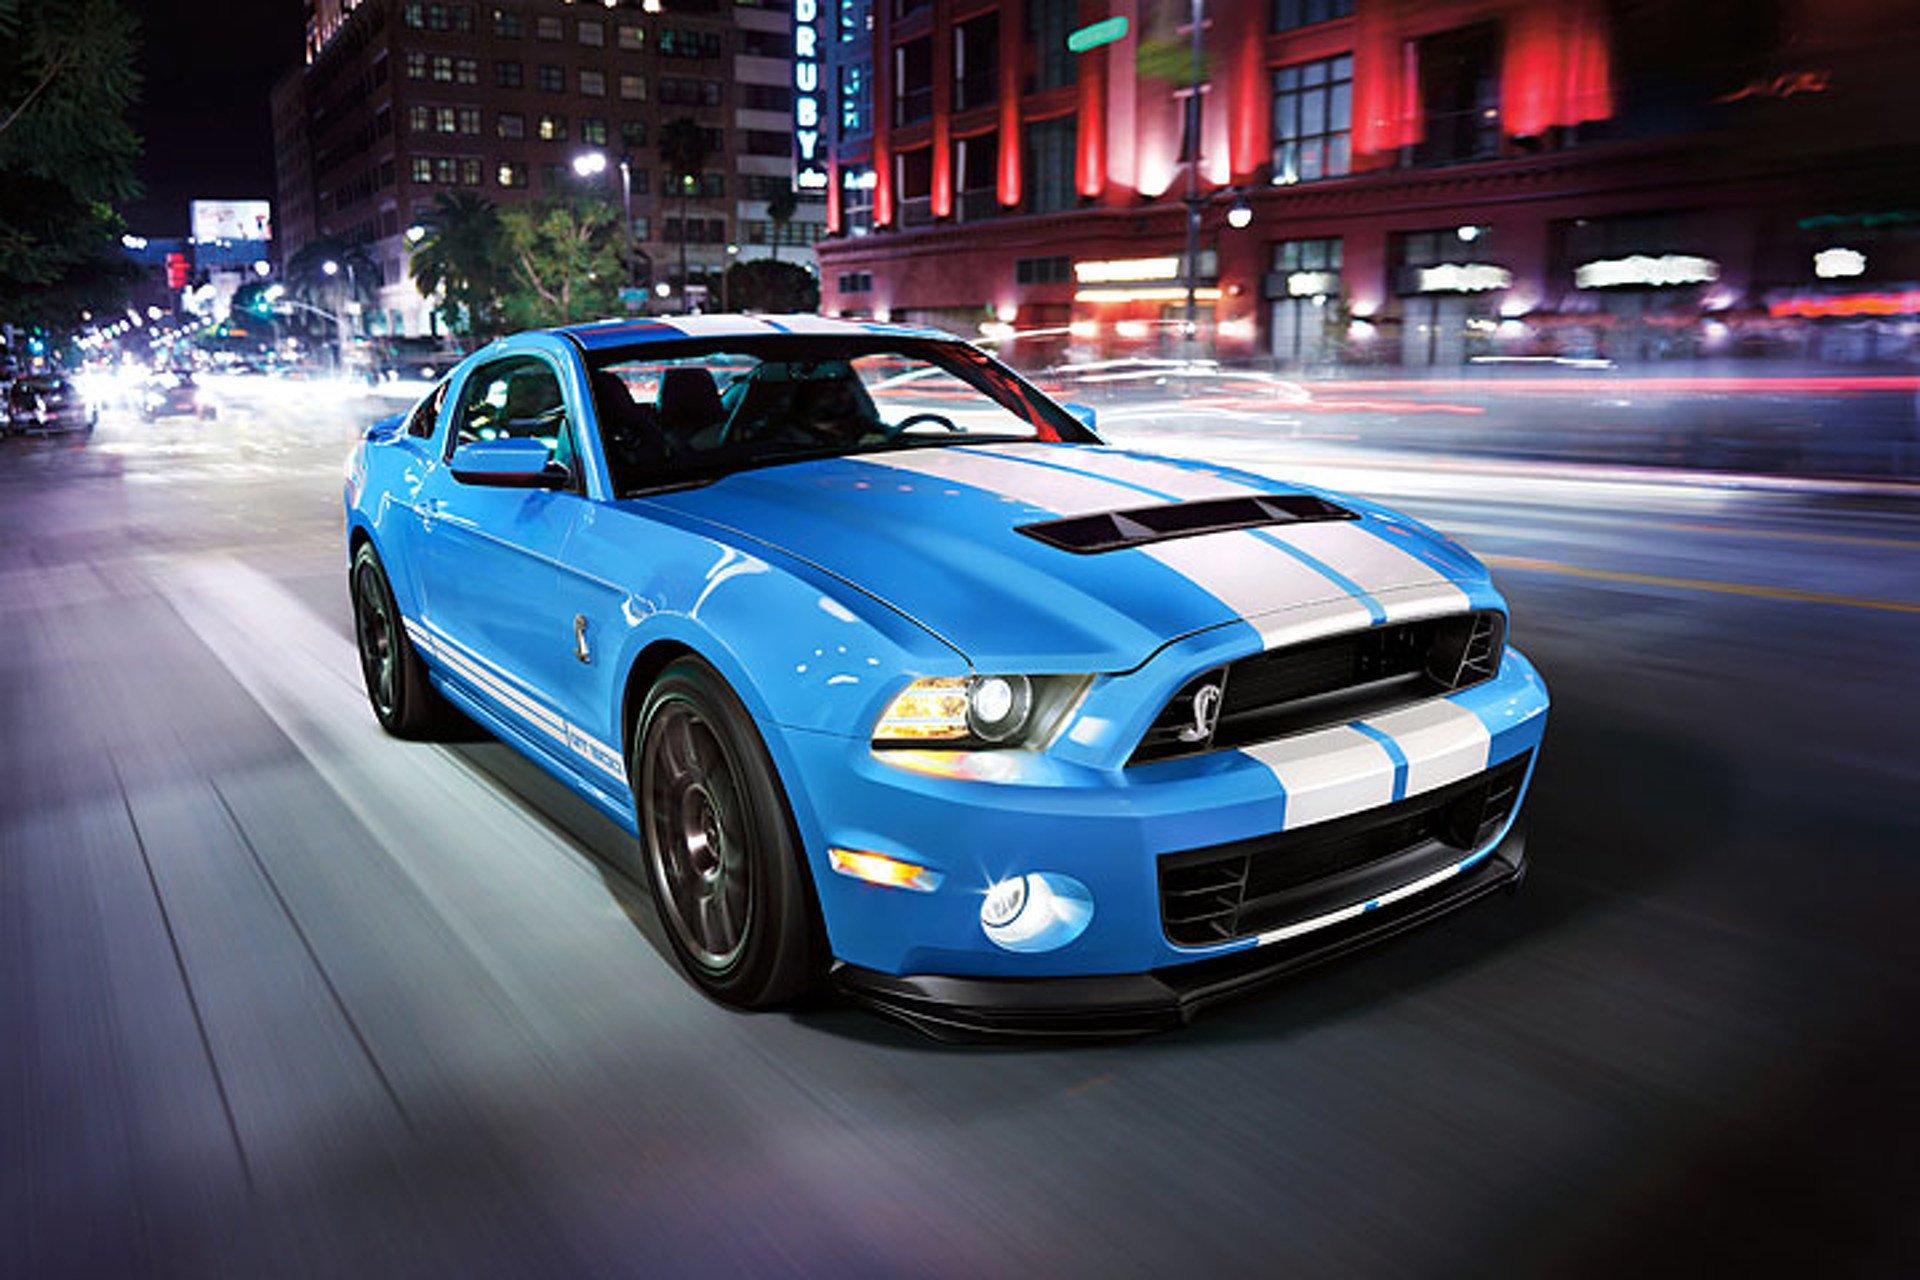 Компания Форд объявила дату презентации Mustang Shelby GT500